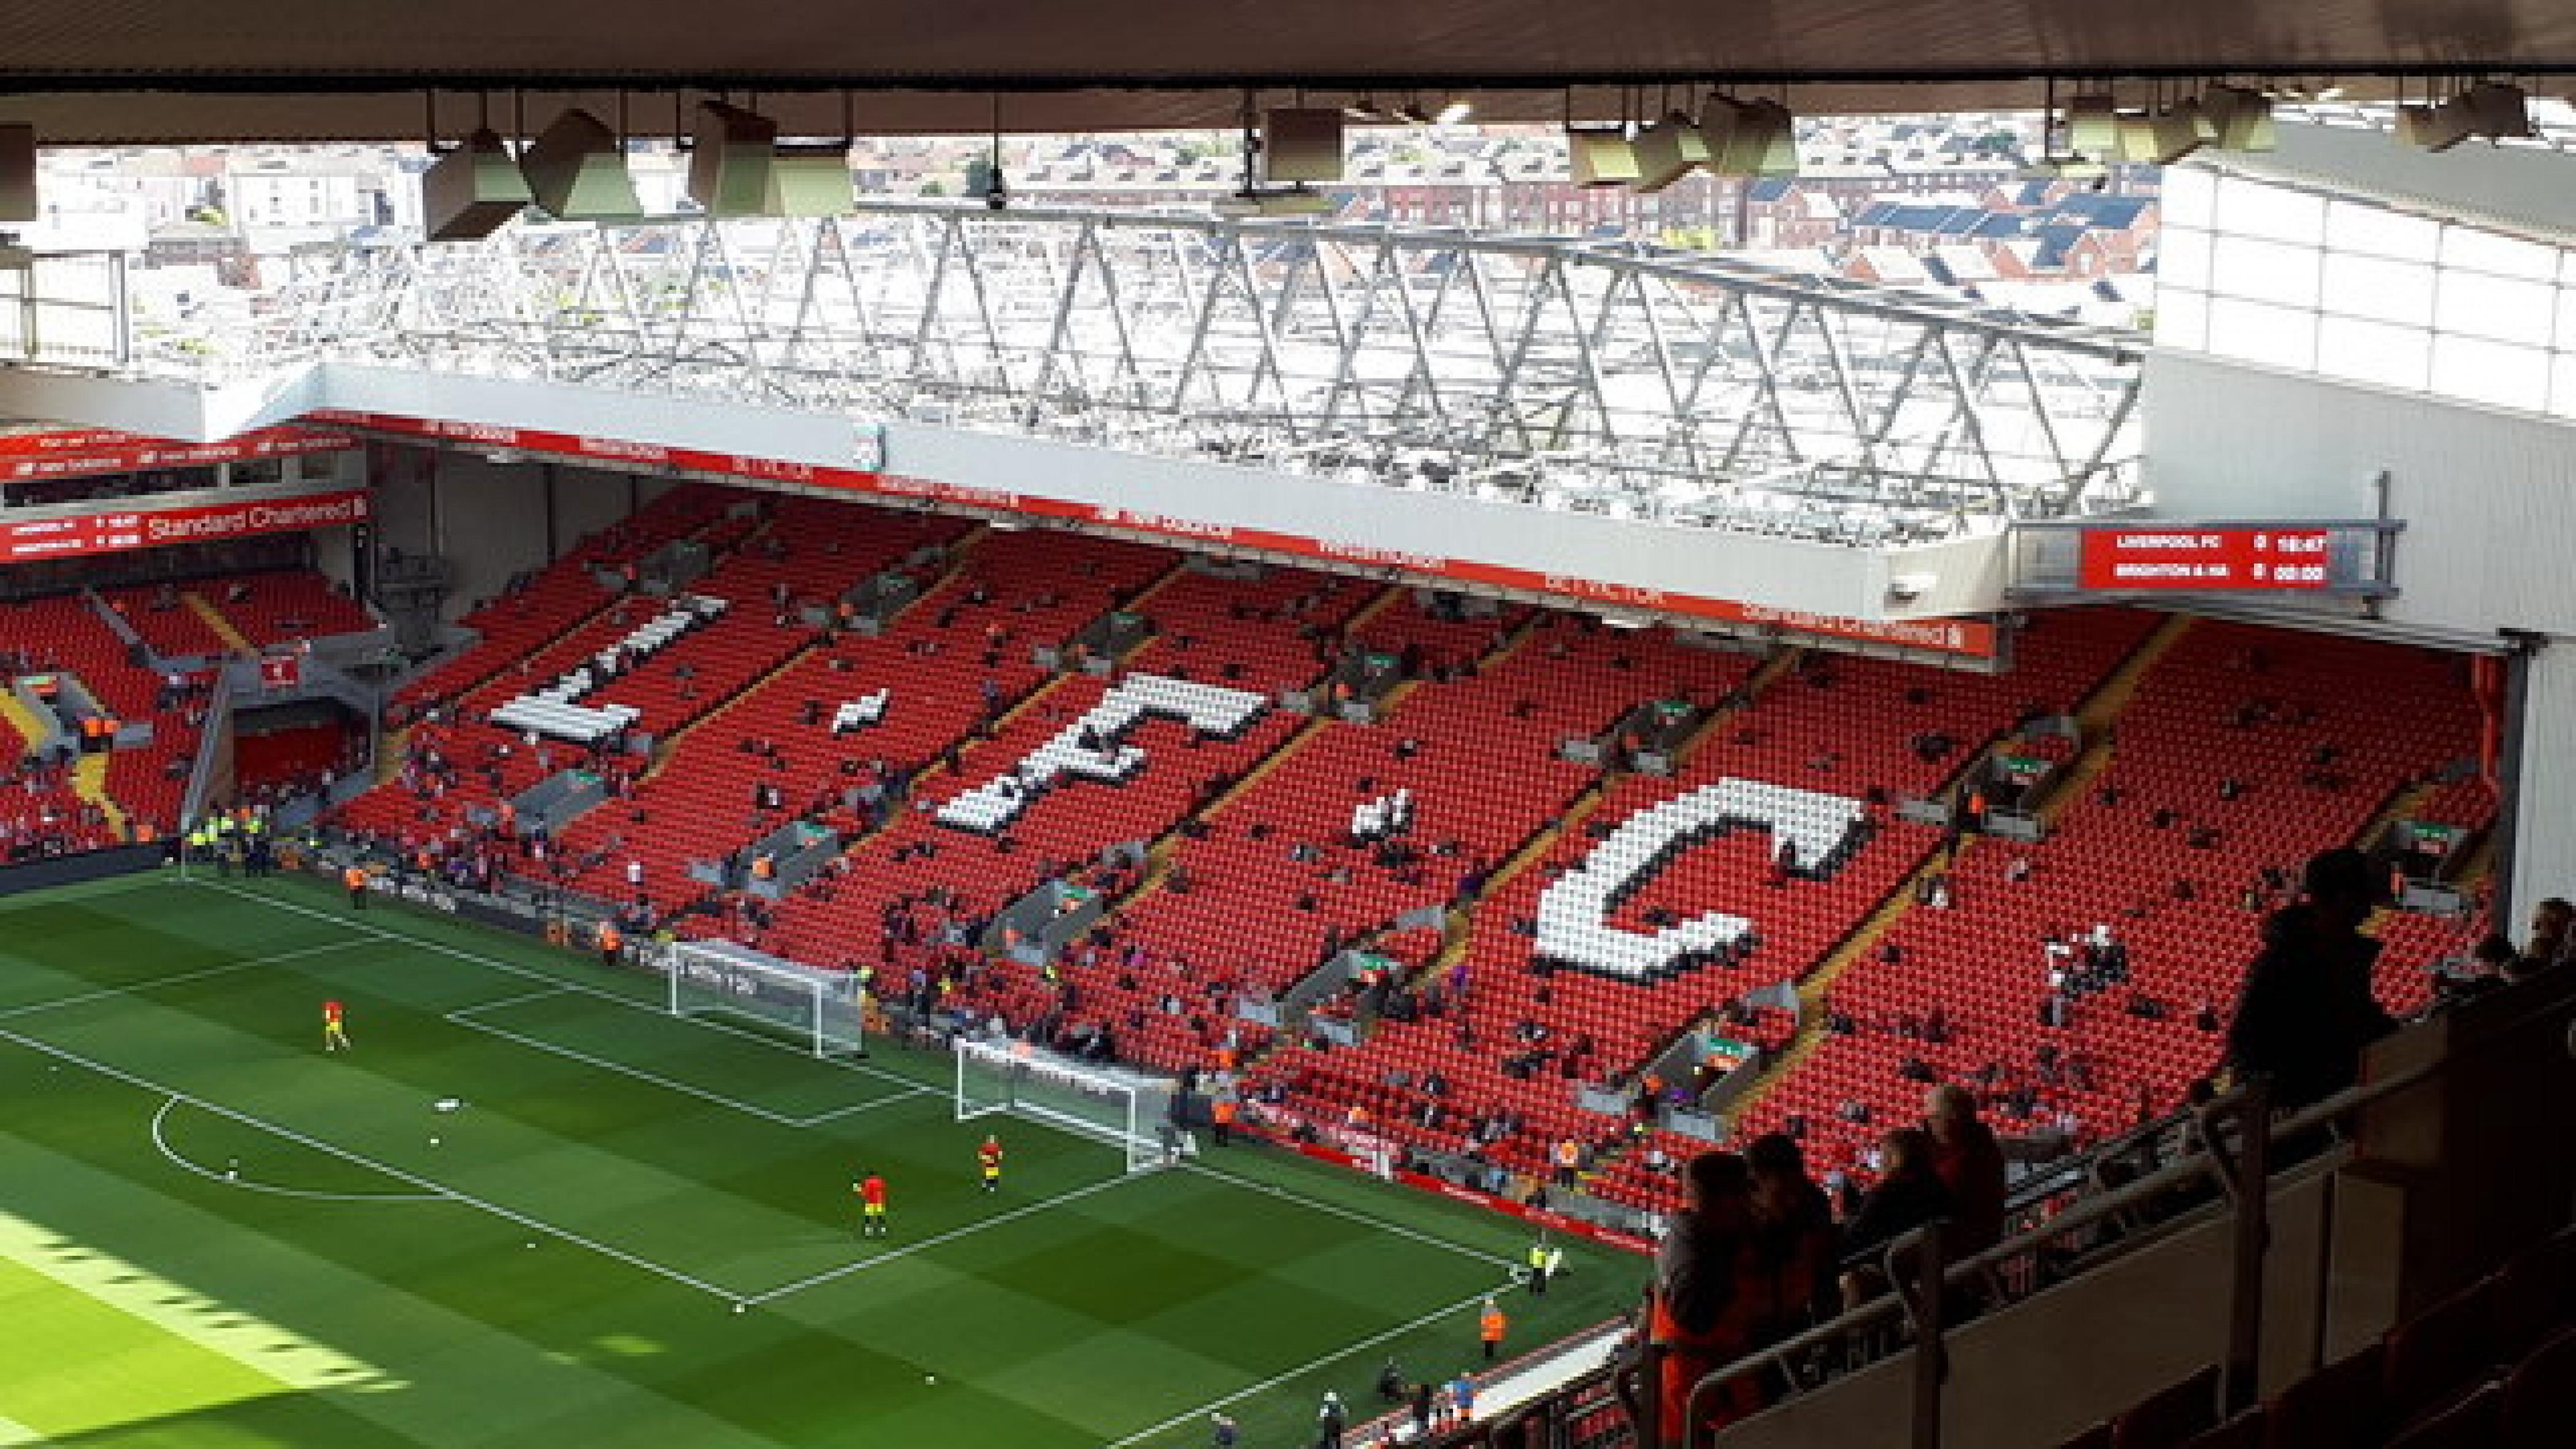 Jurgen Klopp: Reds need focus despite 100% record